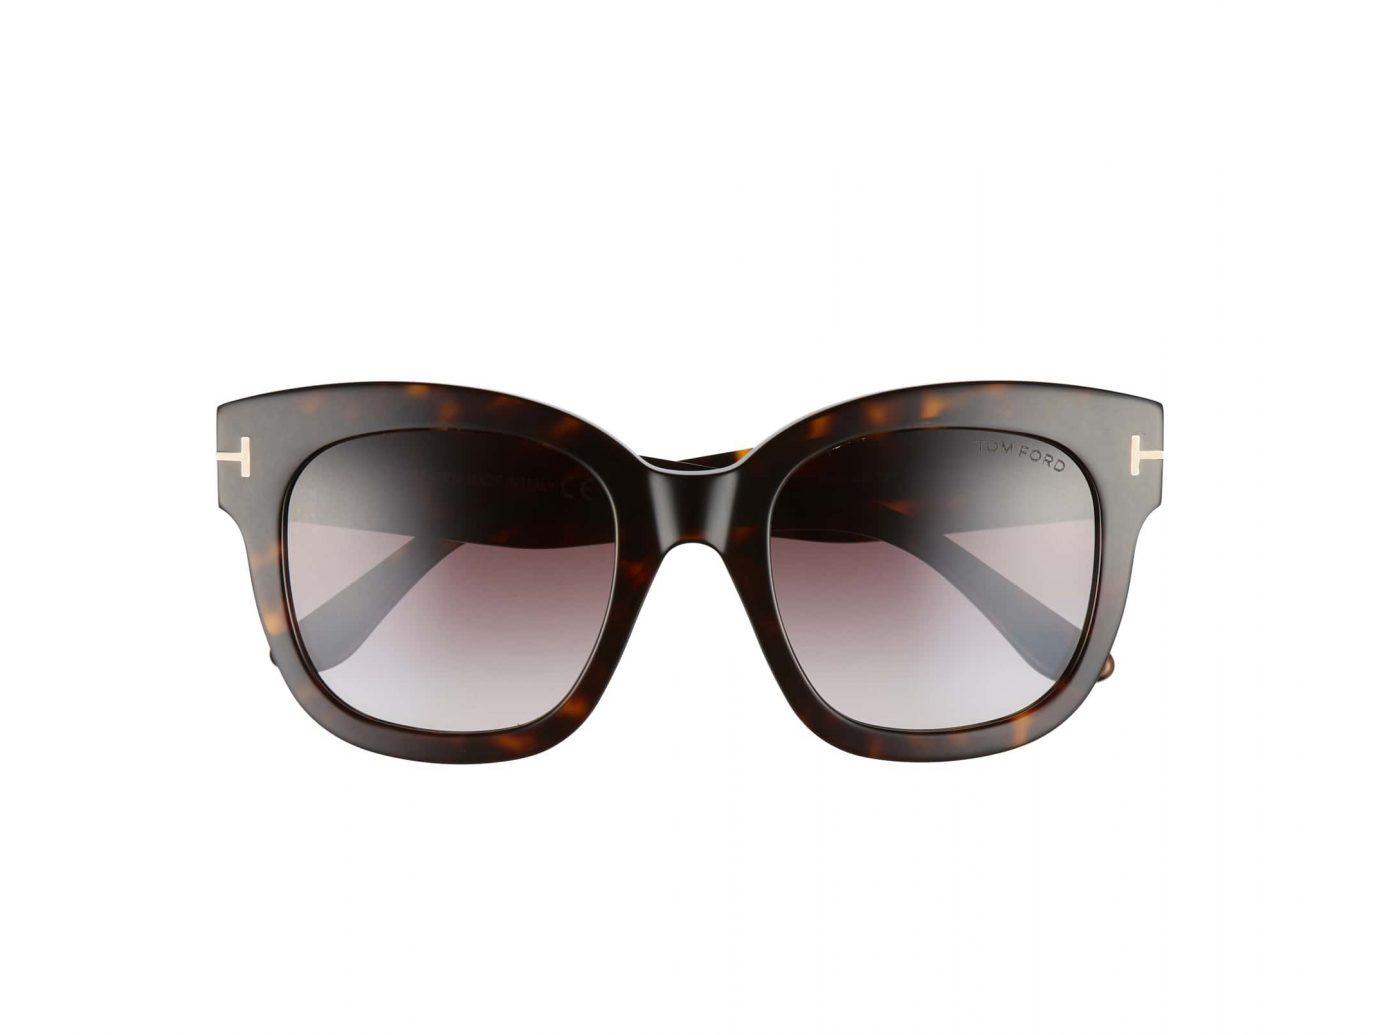 Tom Ford Beatrix Sunglasses